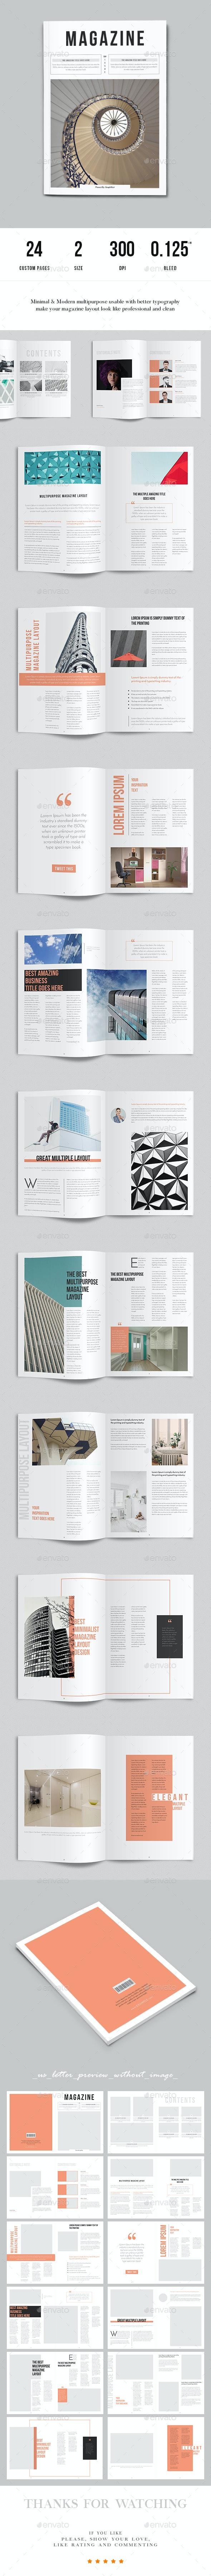 Minimalist Magazine Layout - Magazines Print Templates